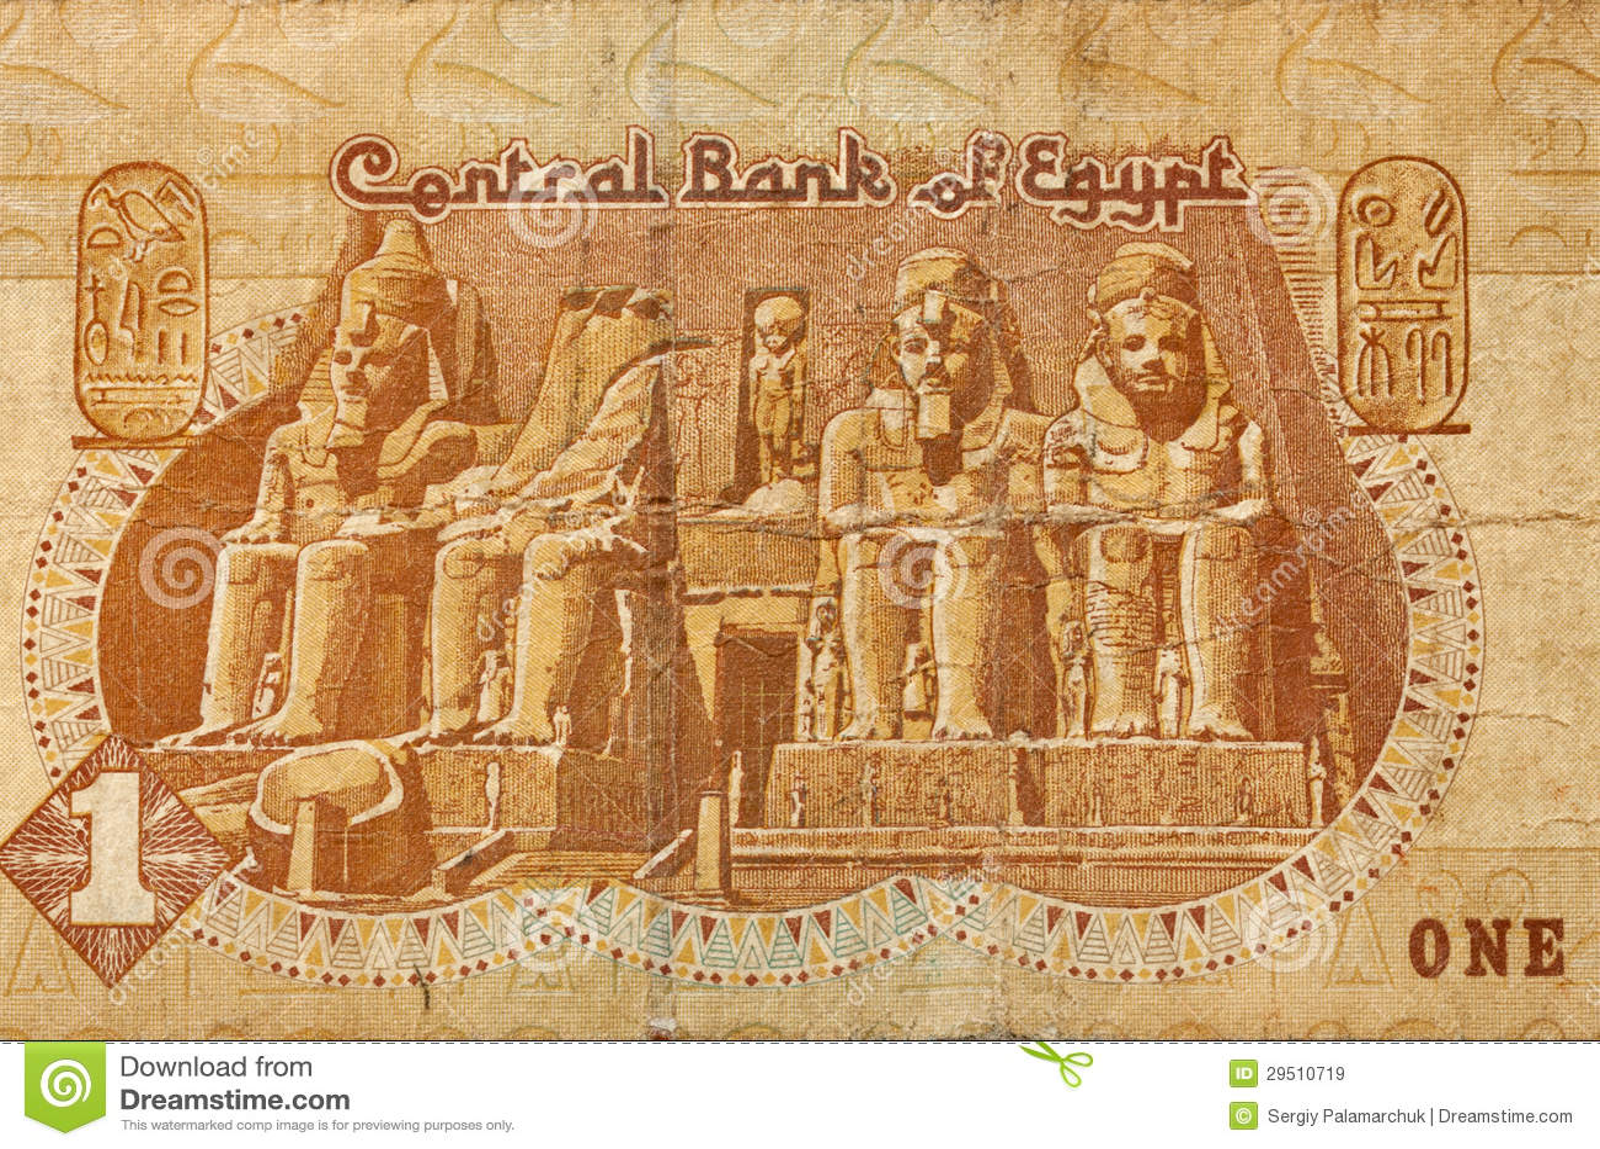 One Egypt Pound Banknote Fragment Stock Image Image Of Egyptian